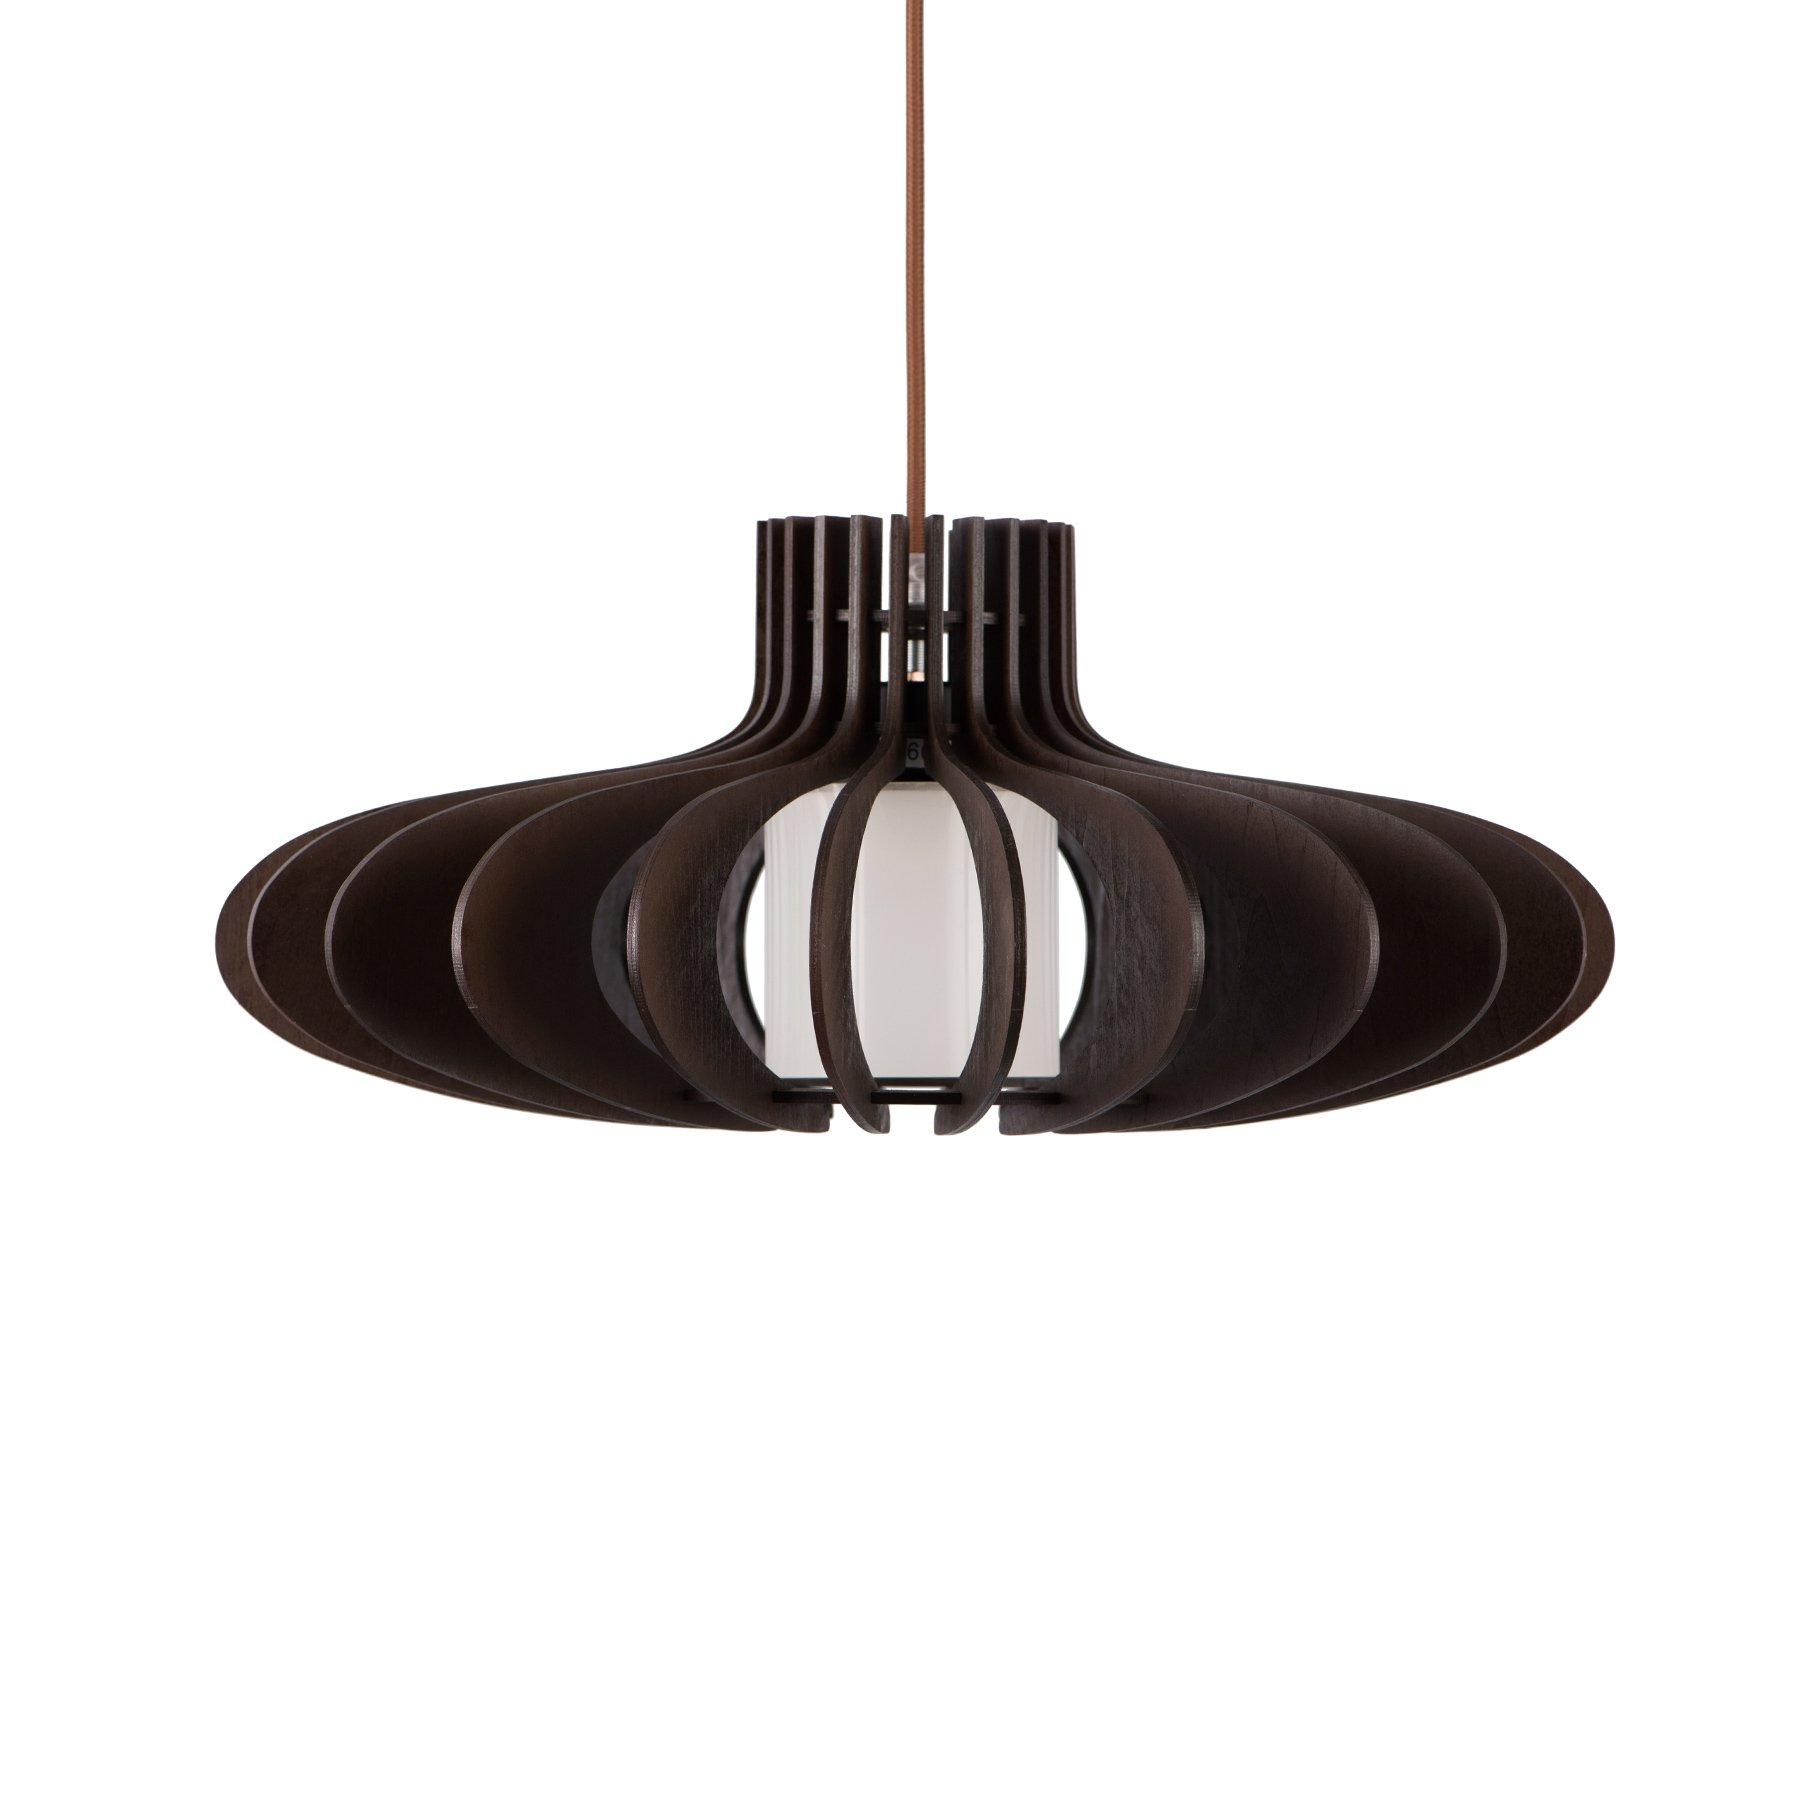 MAYKKE Oban Medium Wooden Pendant Lamp   Lantern Style with Dark Brown Rings, Hanging Light with Adjustable Cord   Walnut Wood Finish, MDB1040201 by Maykke (Image #3)